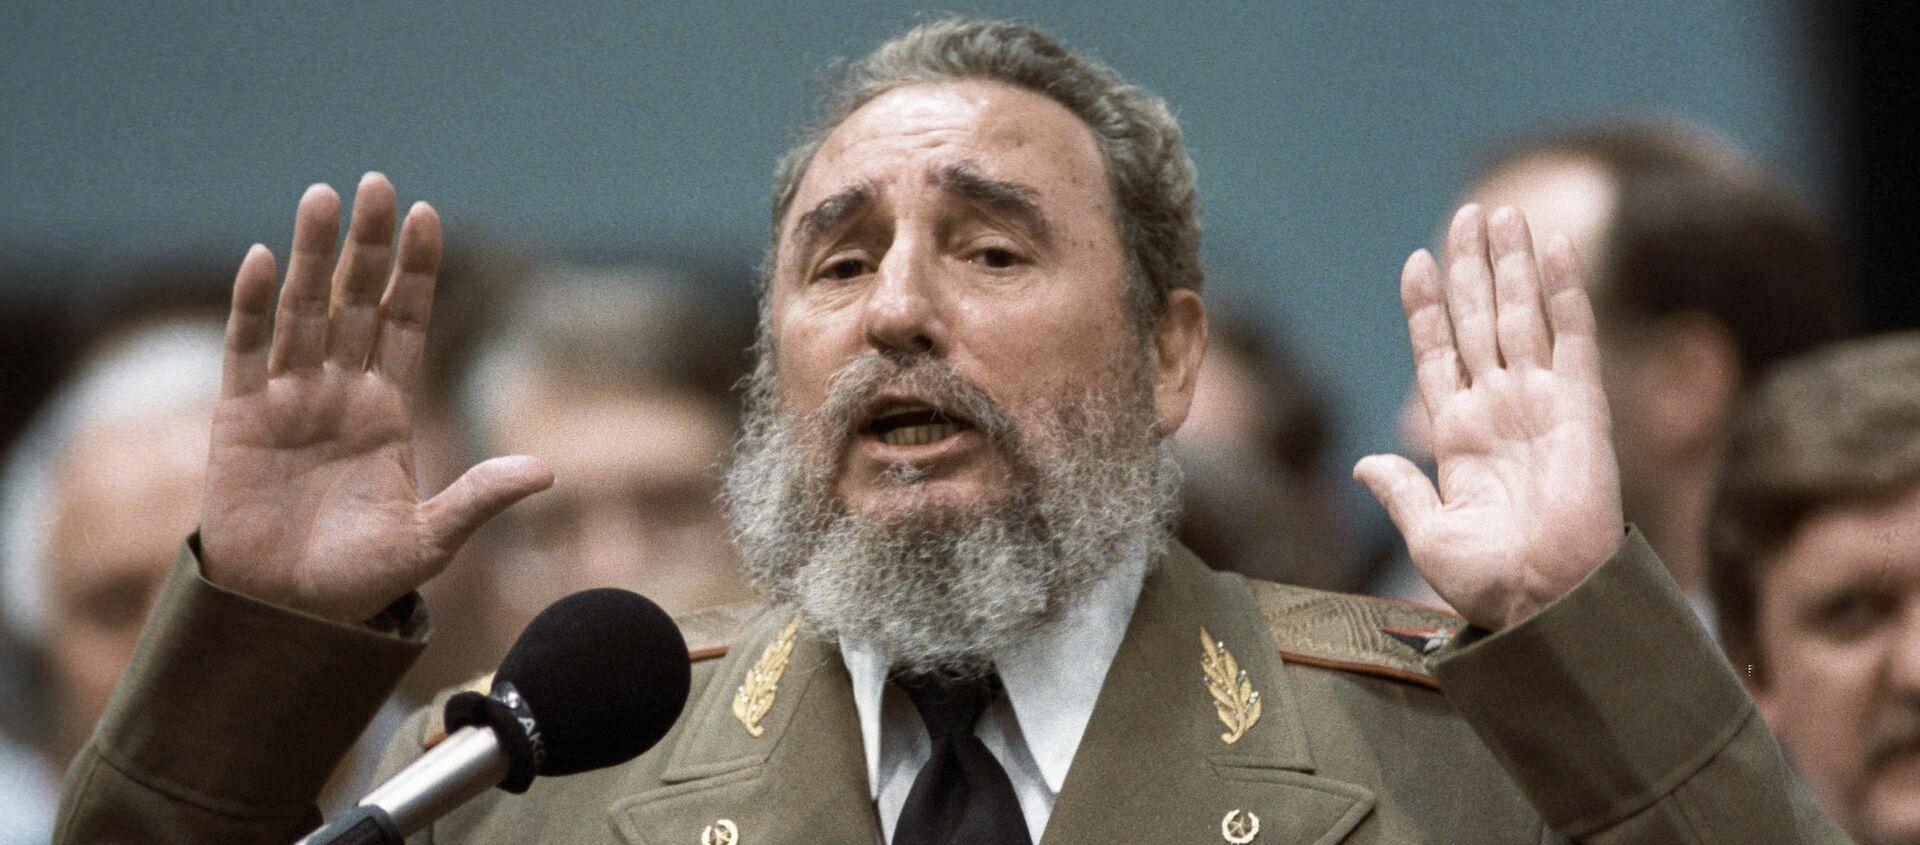 Fidel Castro, líder de la Revolución Cubana - Sputnik Mundo, 1920, 25.11.2020